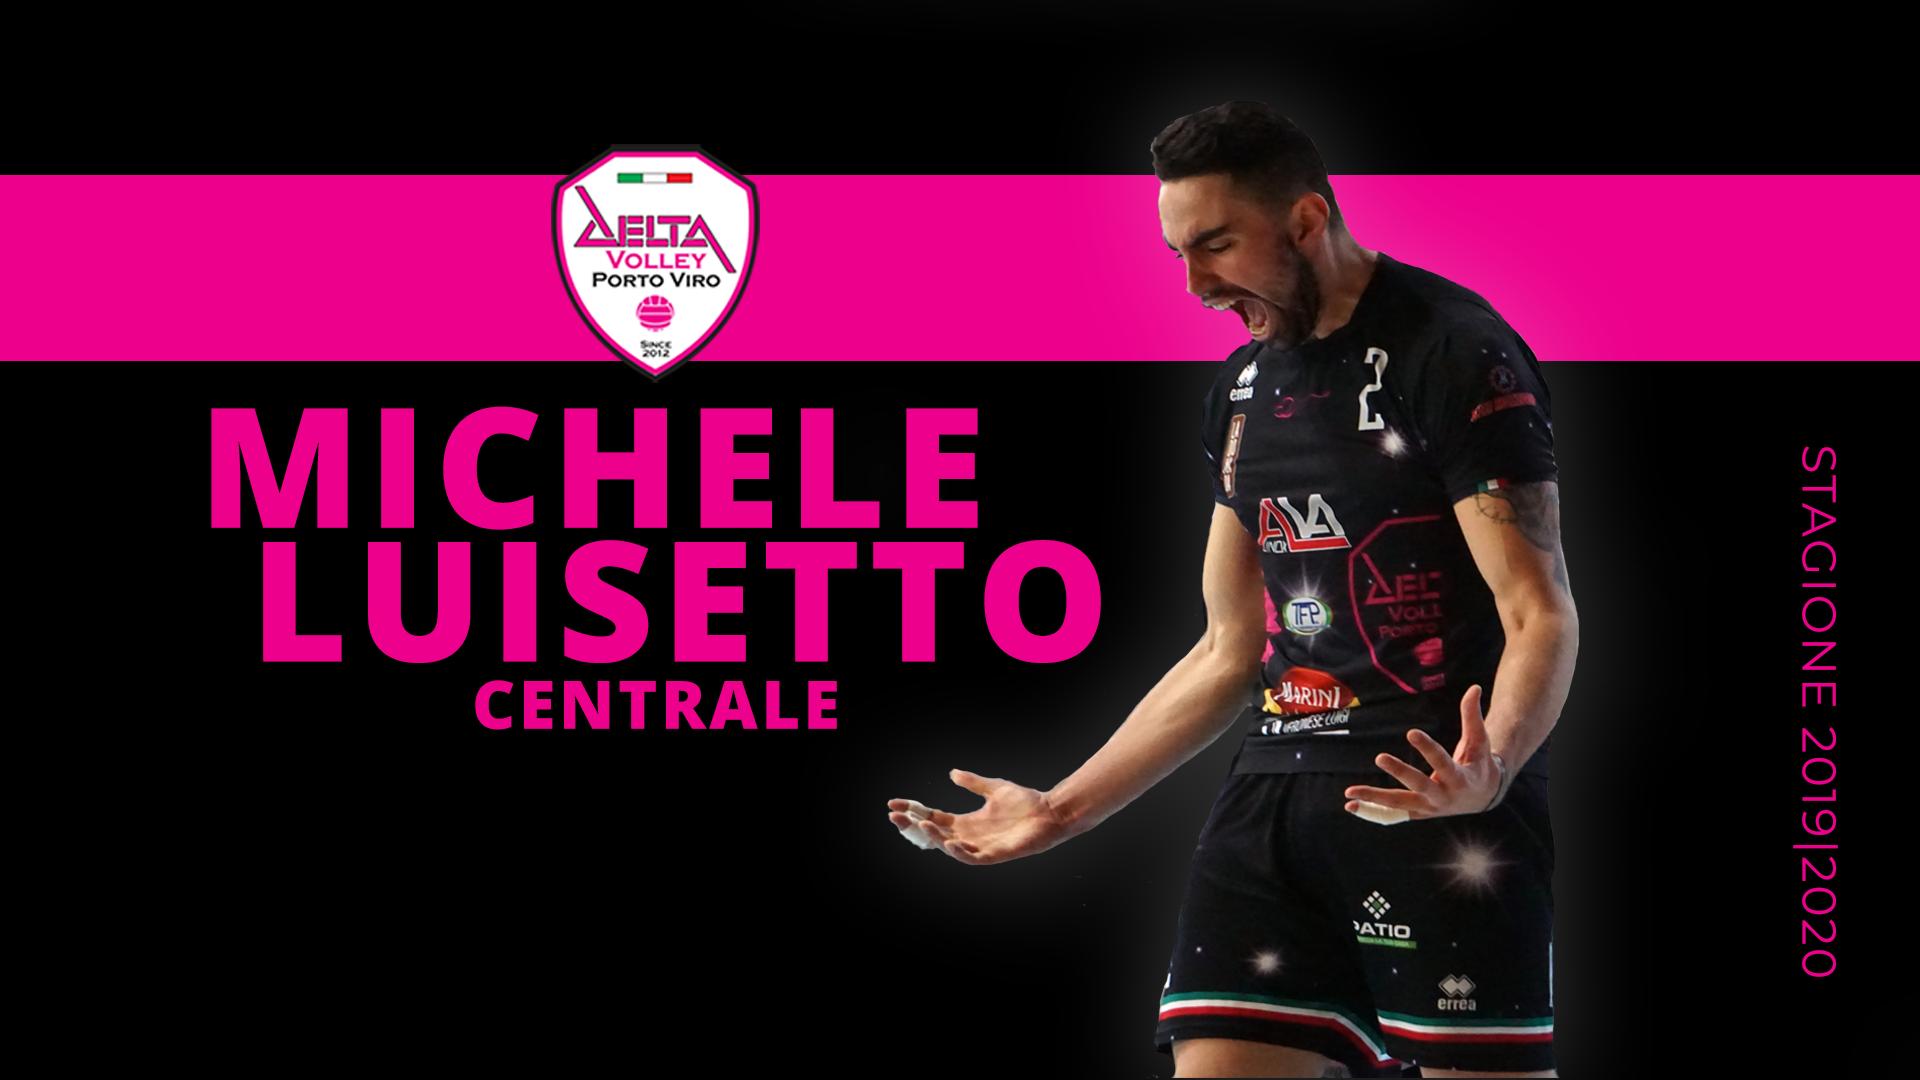 Michele Luisetto